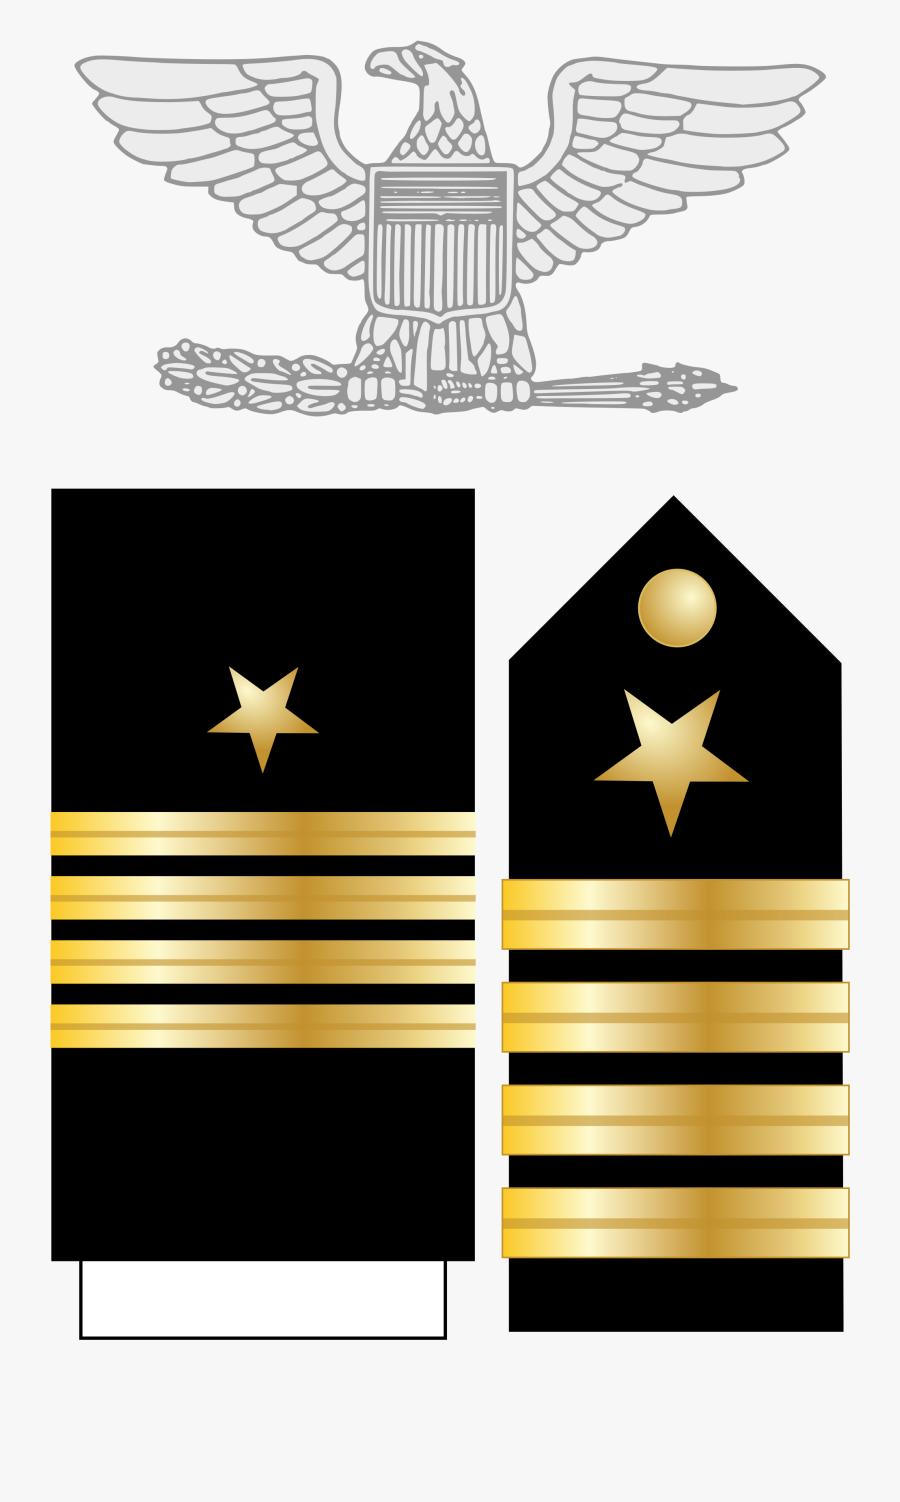 Transparent Us Navy Logo Png - Us Navy Captain Rank Insignia, Transparent Clipart